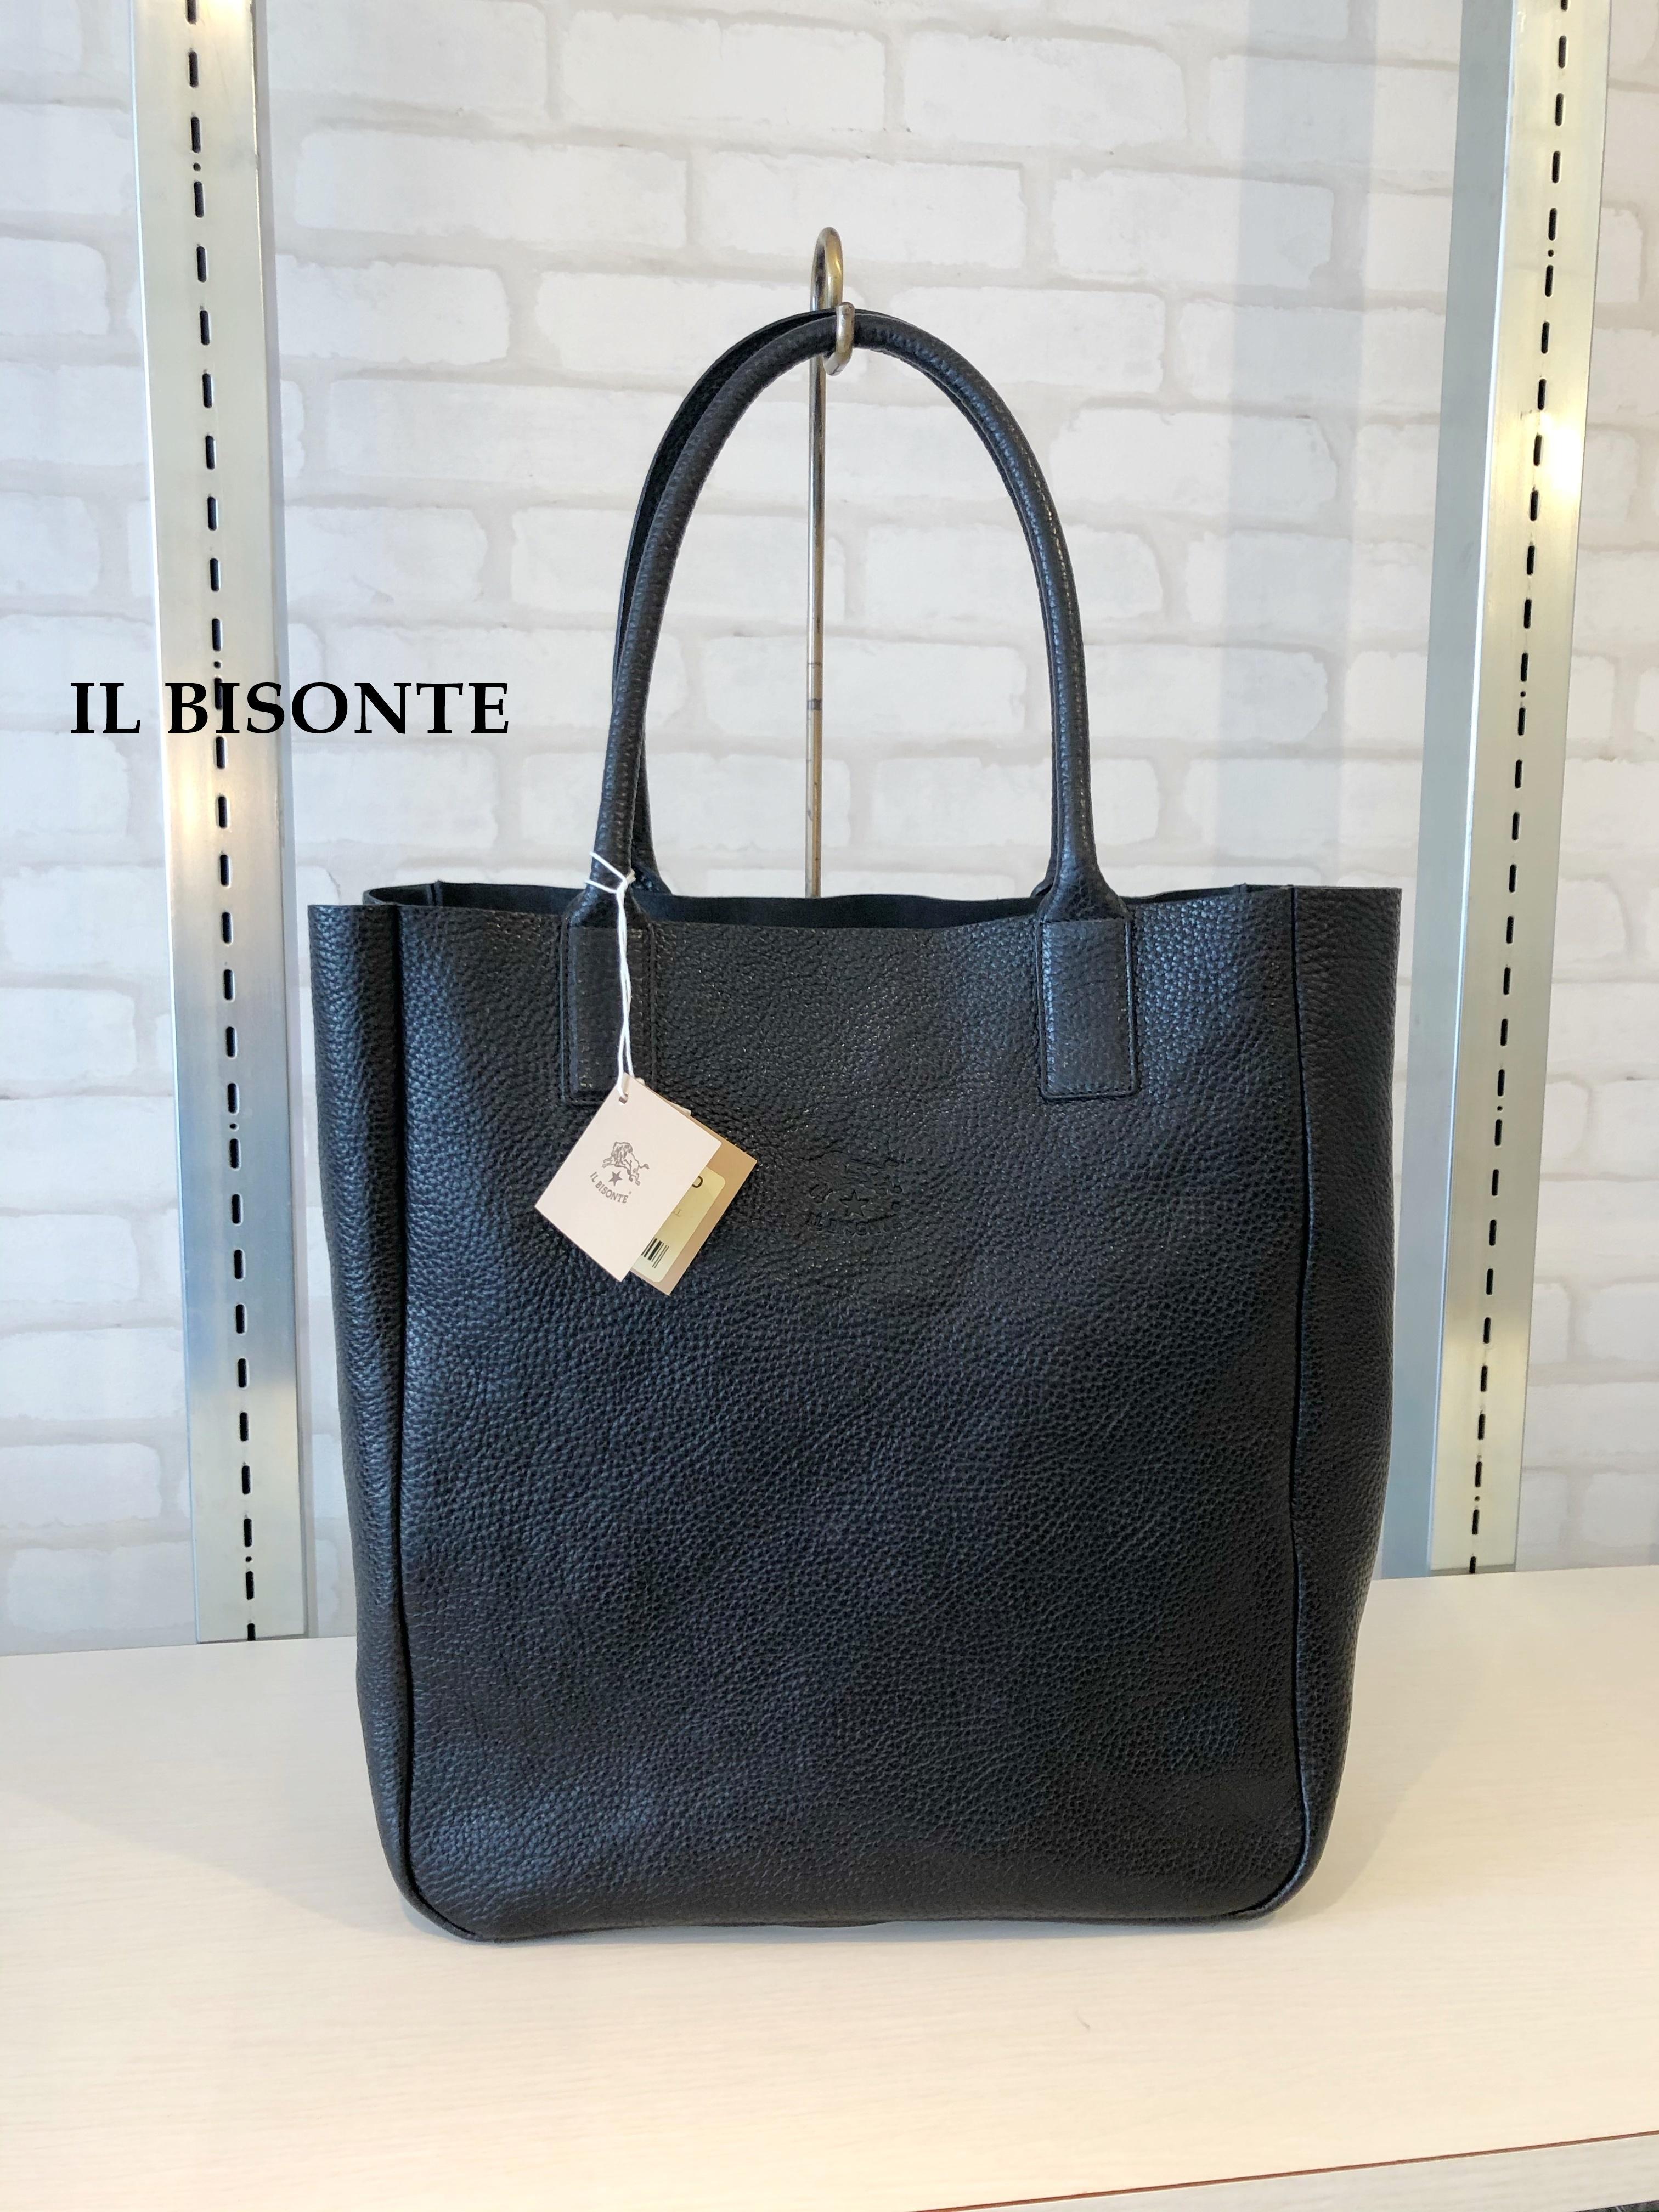 IL BISONTE(イルビゾンテ)/縦長トートバッグ/04114(ブラック)